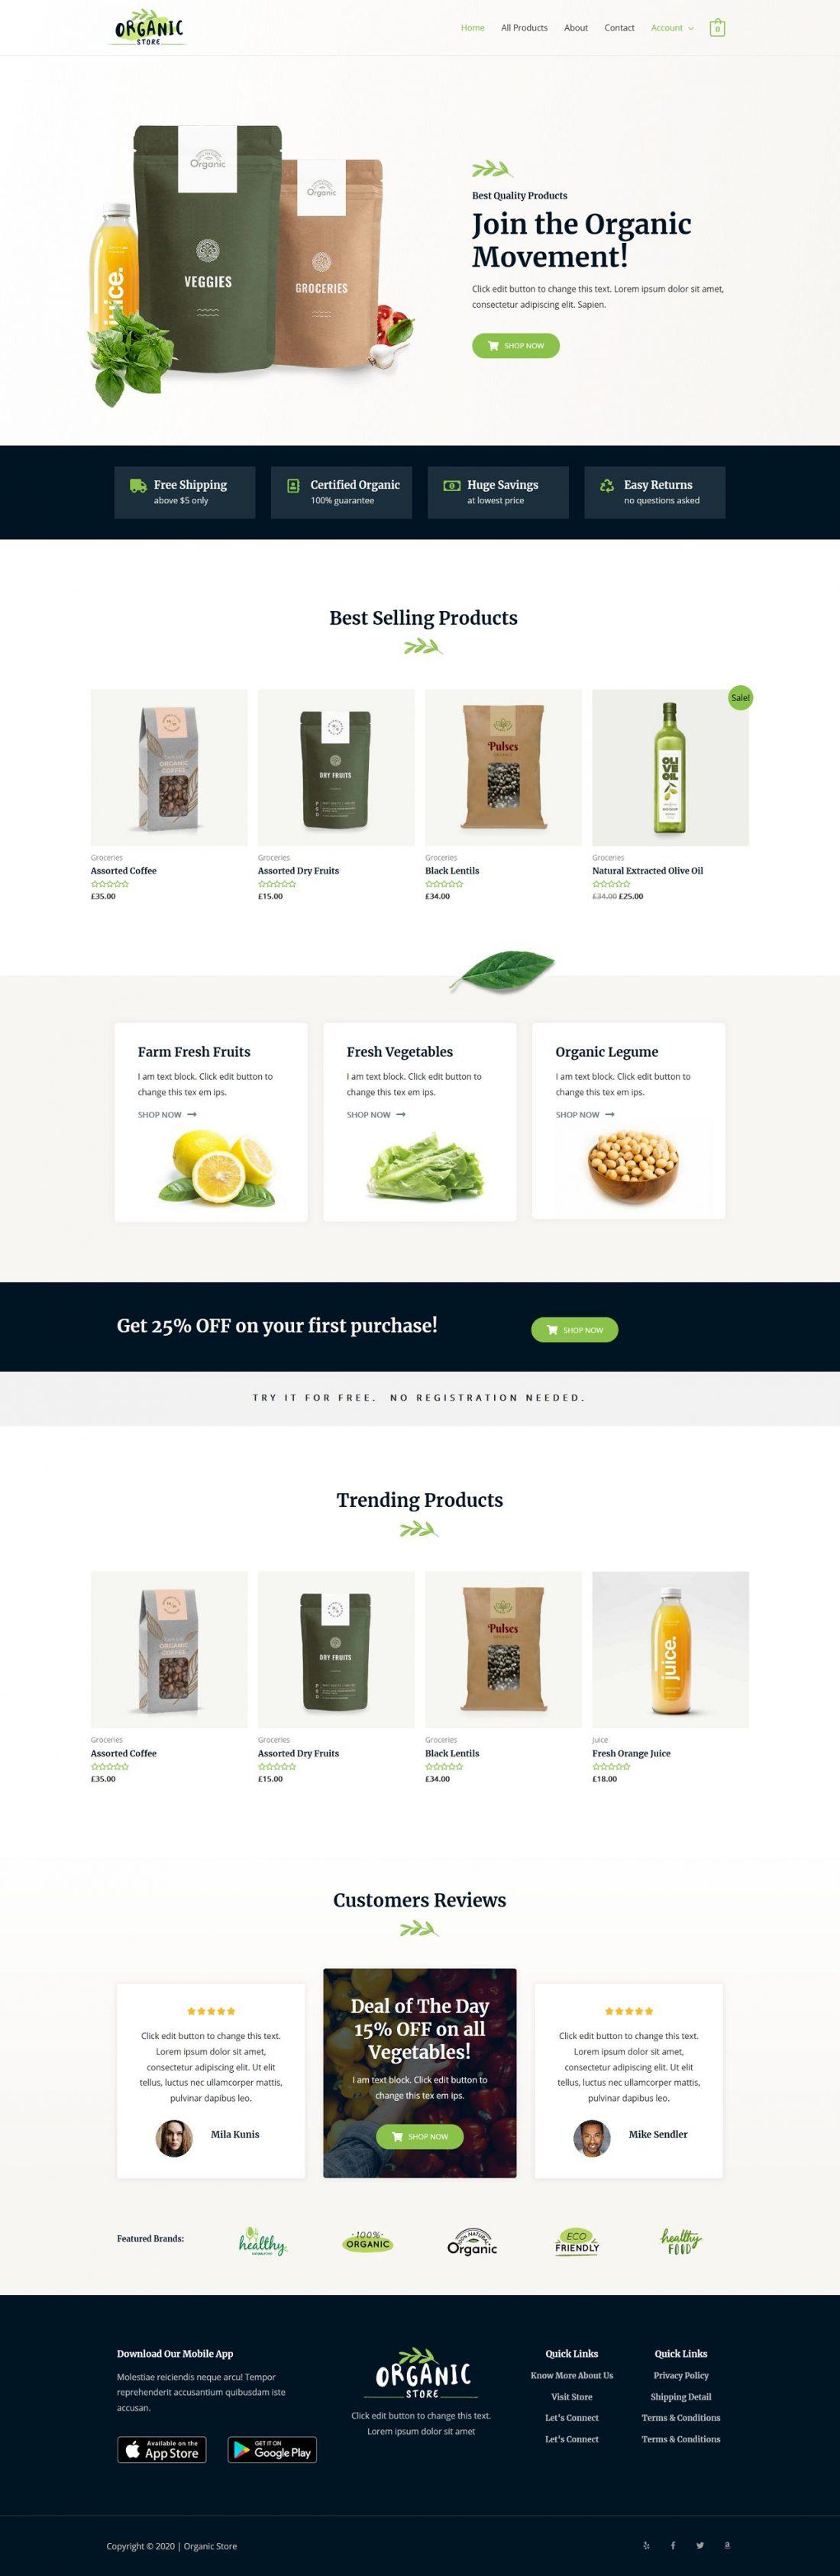 Fagowi.com Website Design Templates For Organic Online Shop - Home Page Image